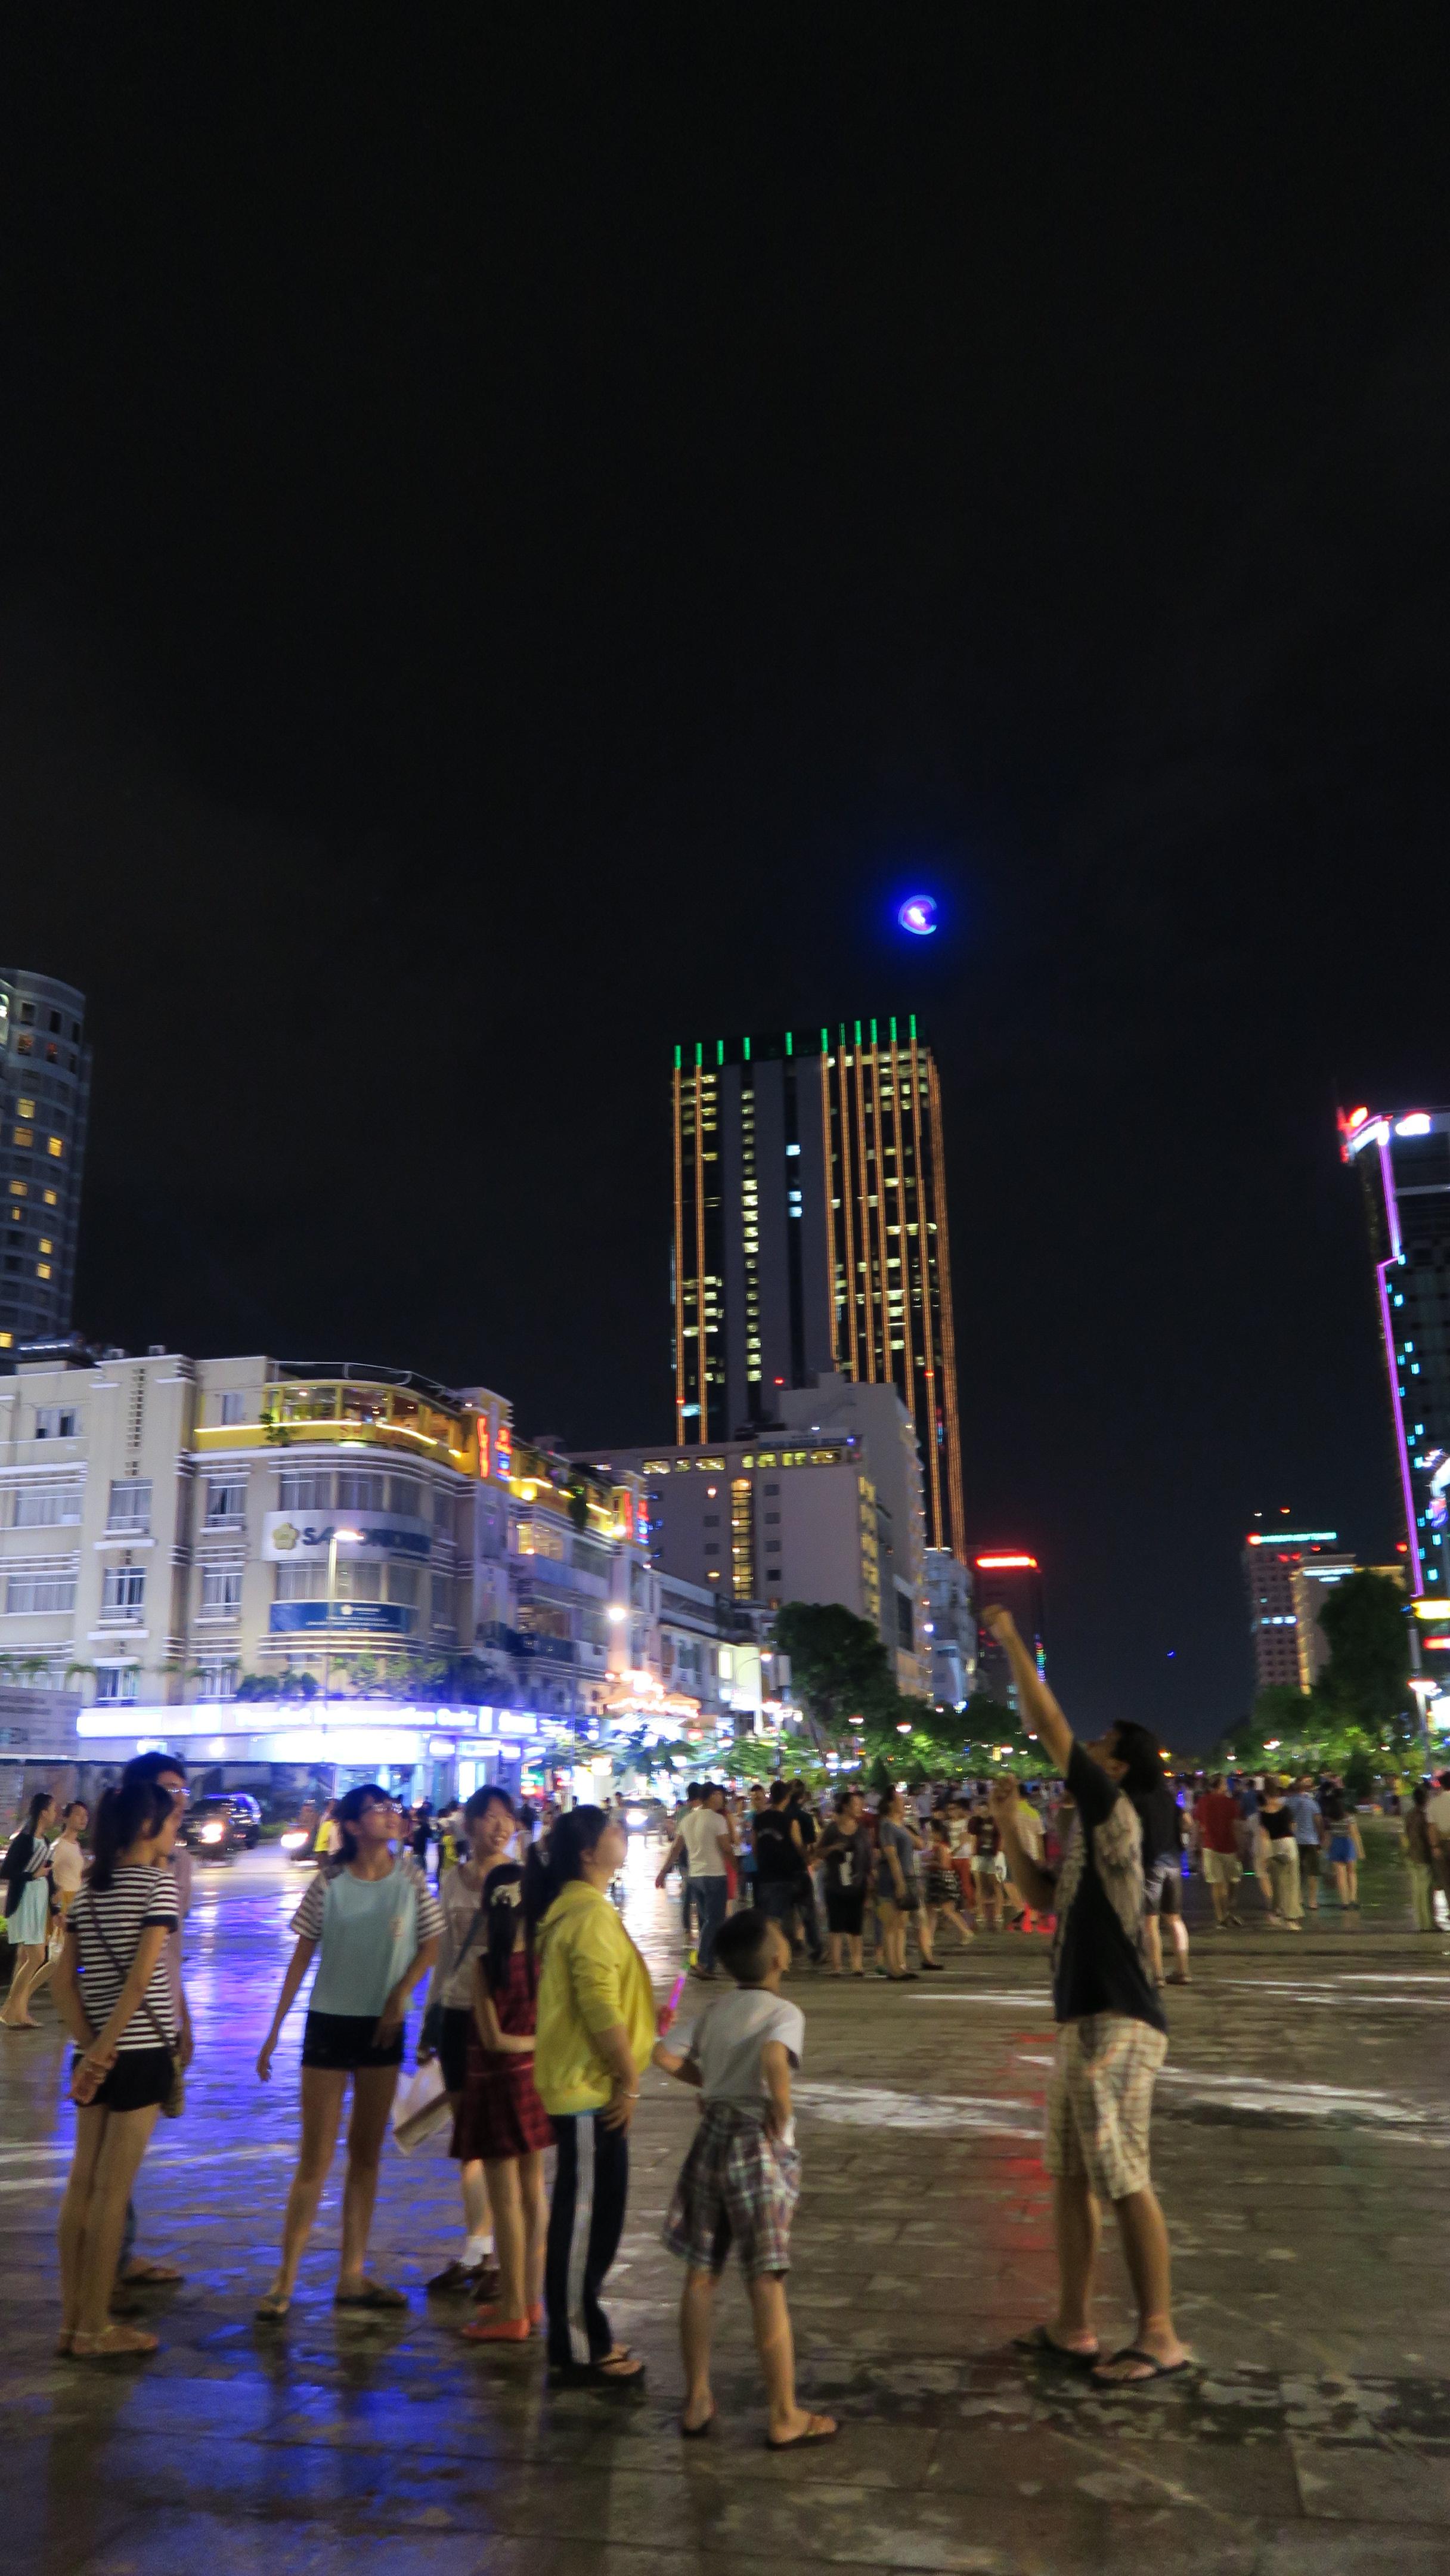 Nguyen Hue Pedestrian Street at night